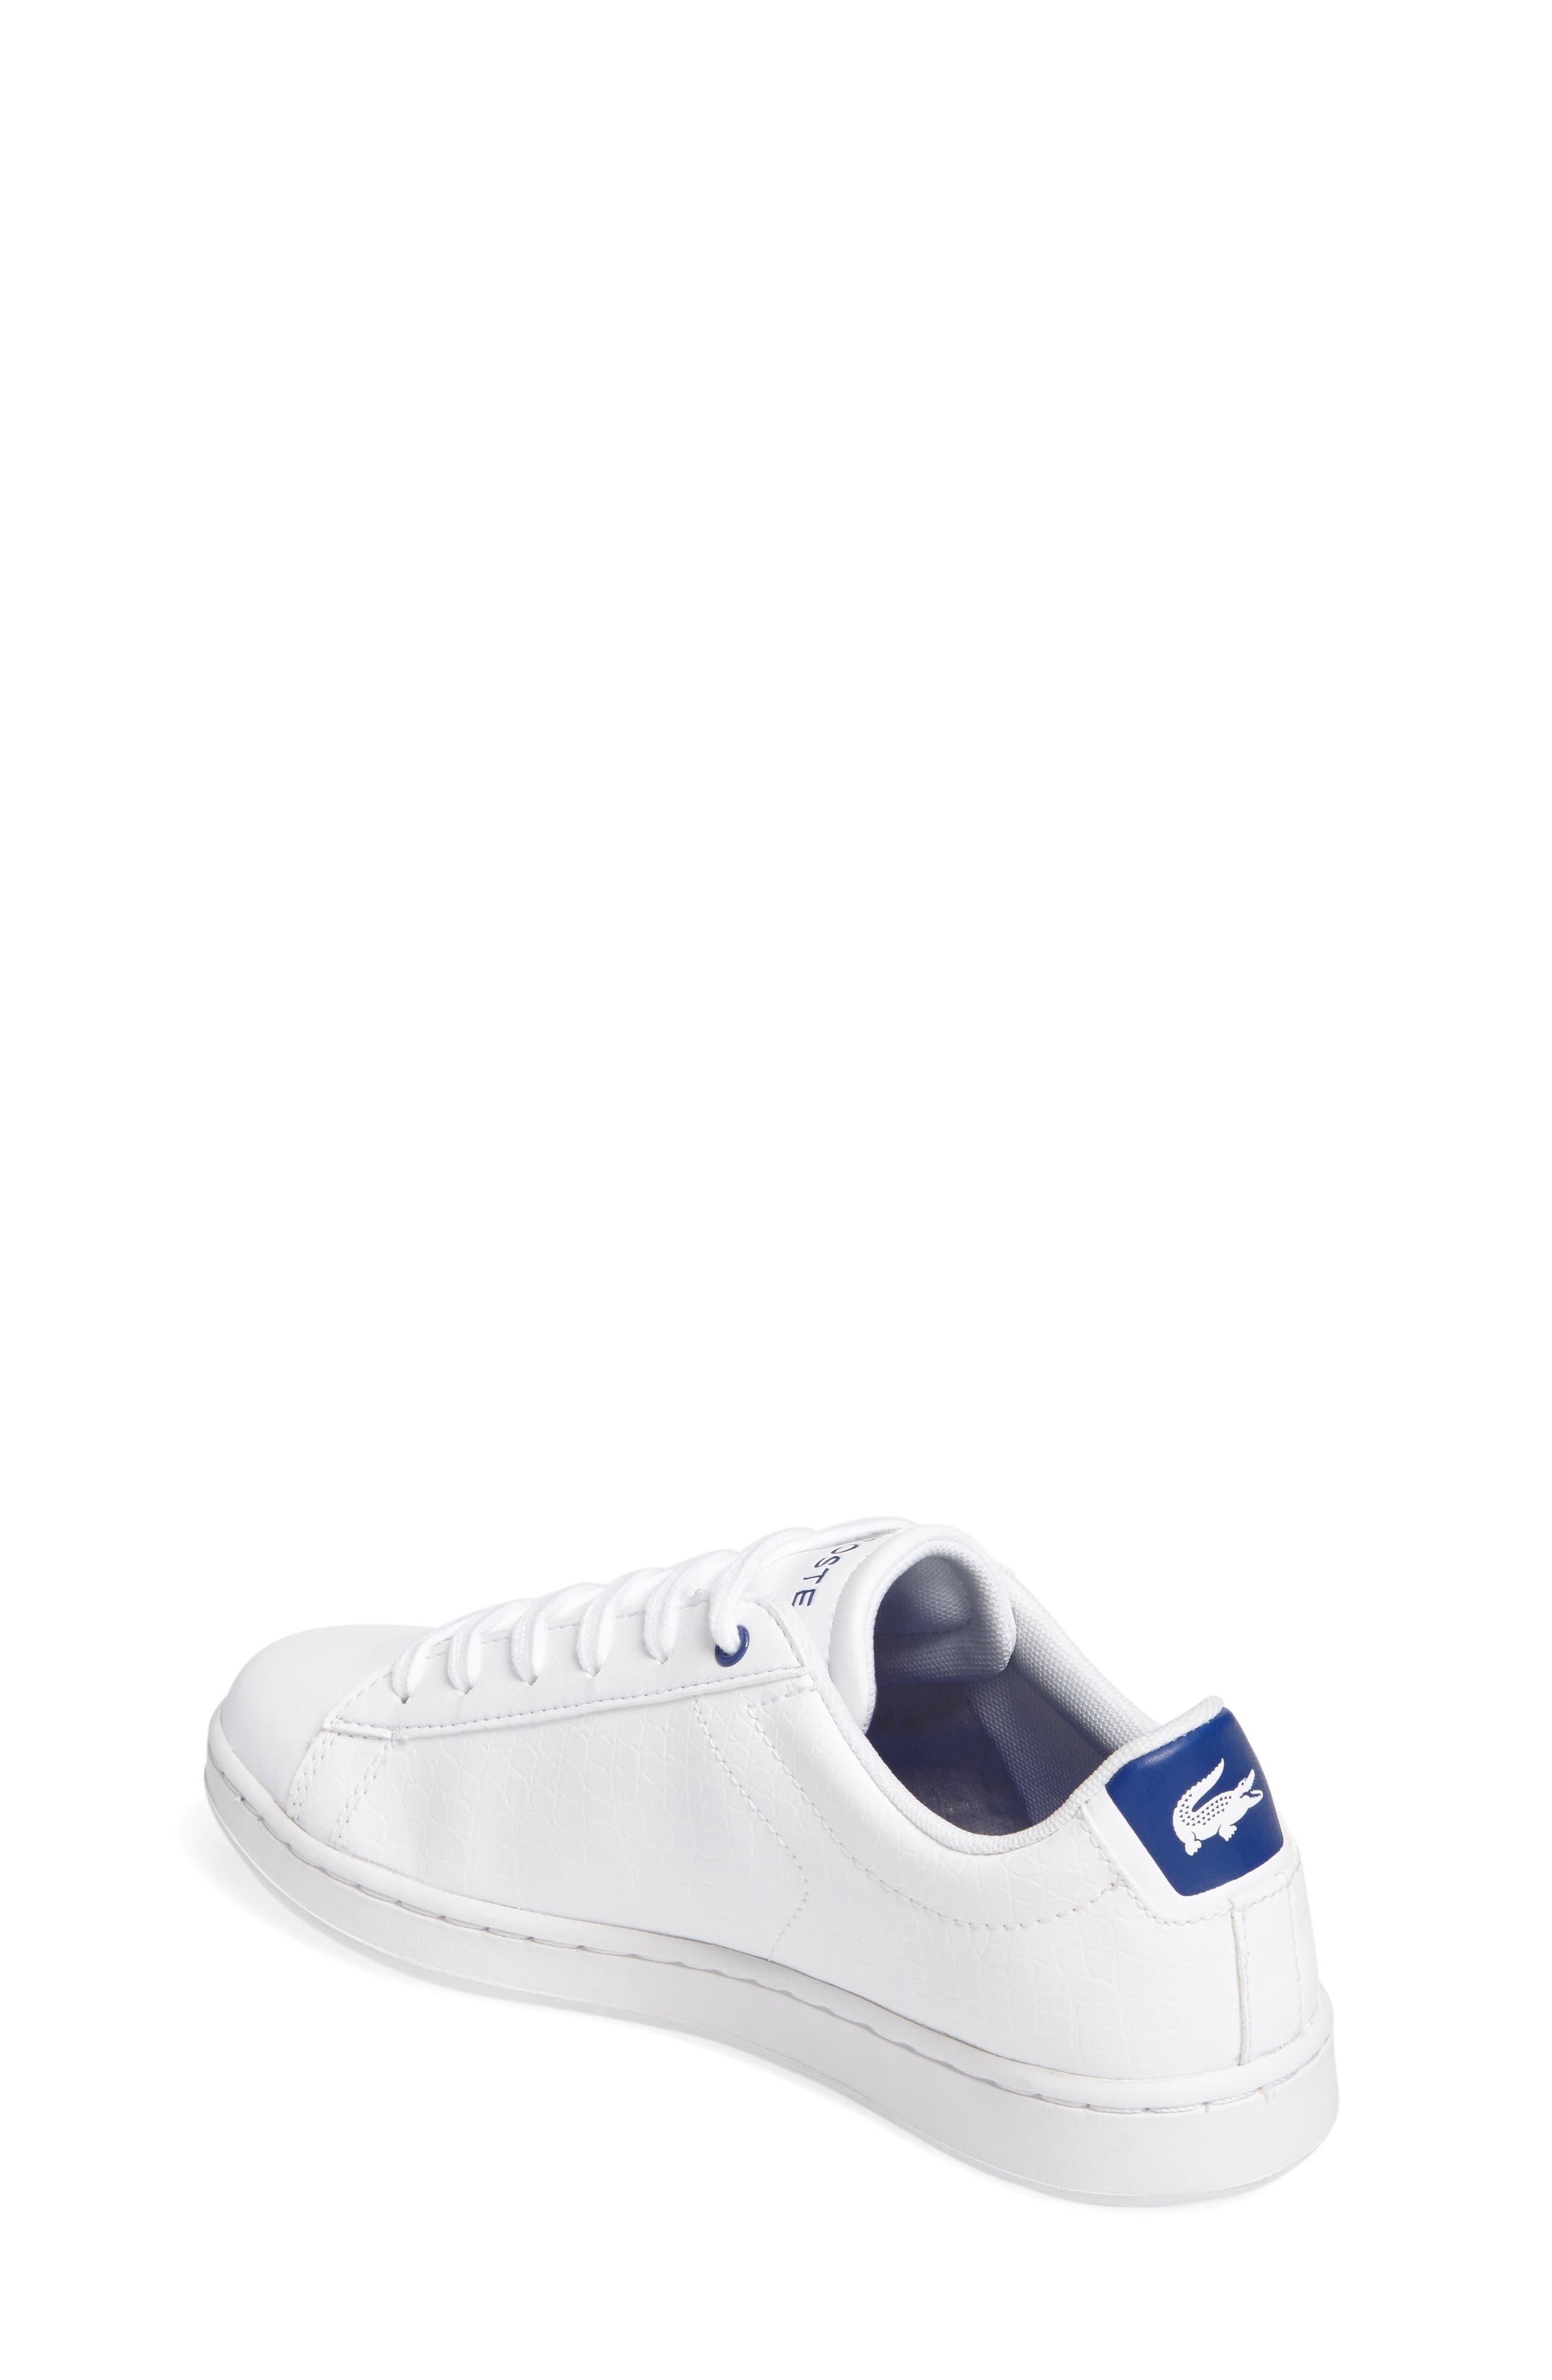 Carnaby EVO Sneaker,                             Alternate thumbnail 2, color,                             129